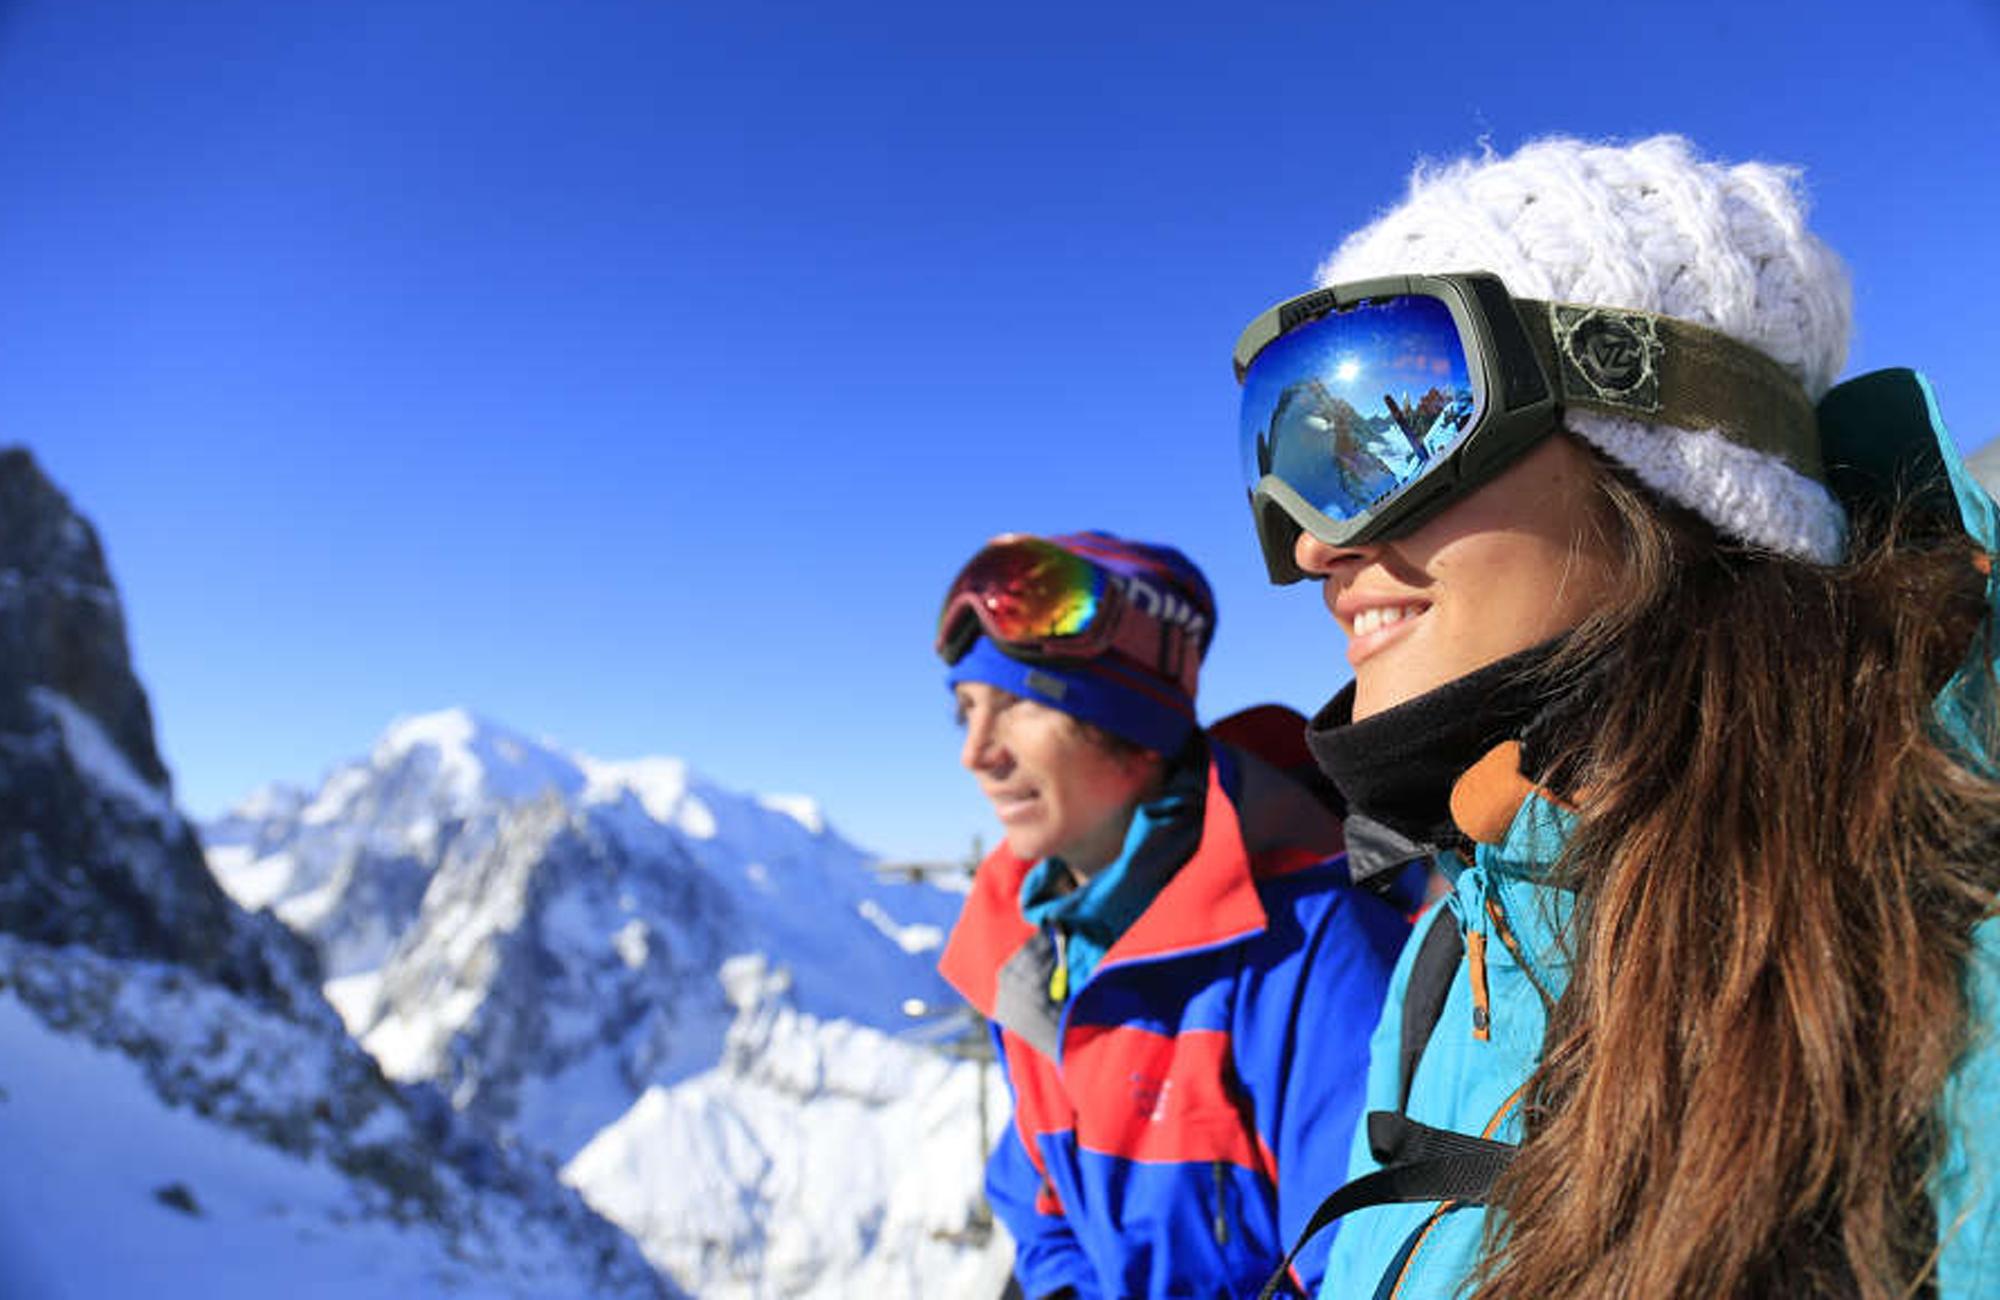 Cold Fusion Chalets - Singles Ski & Snowboarding Holidays